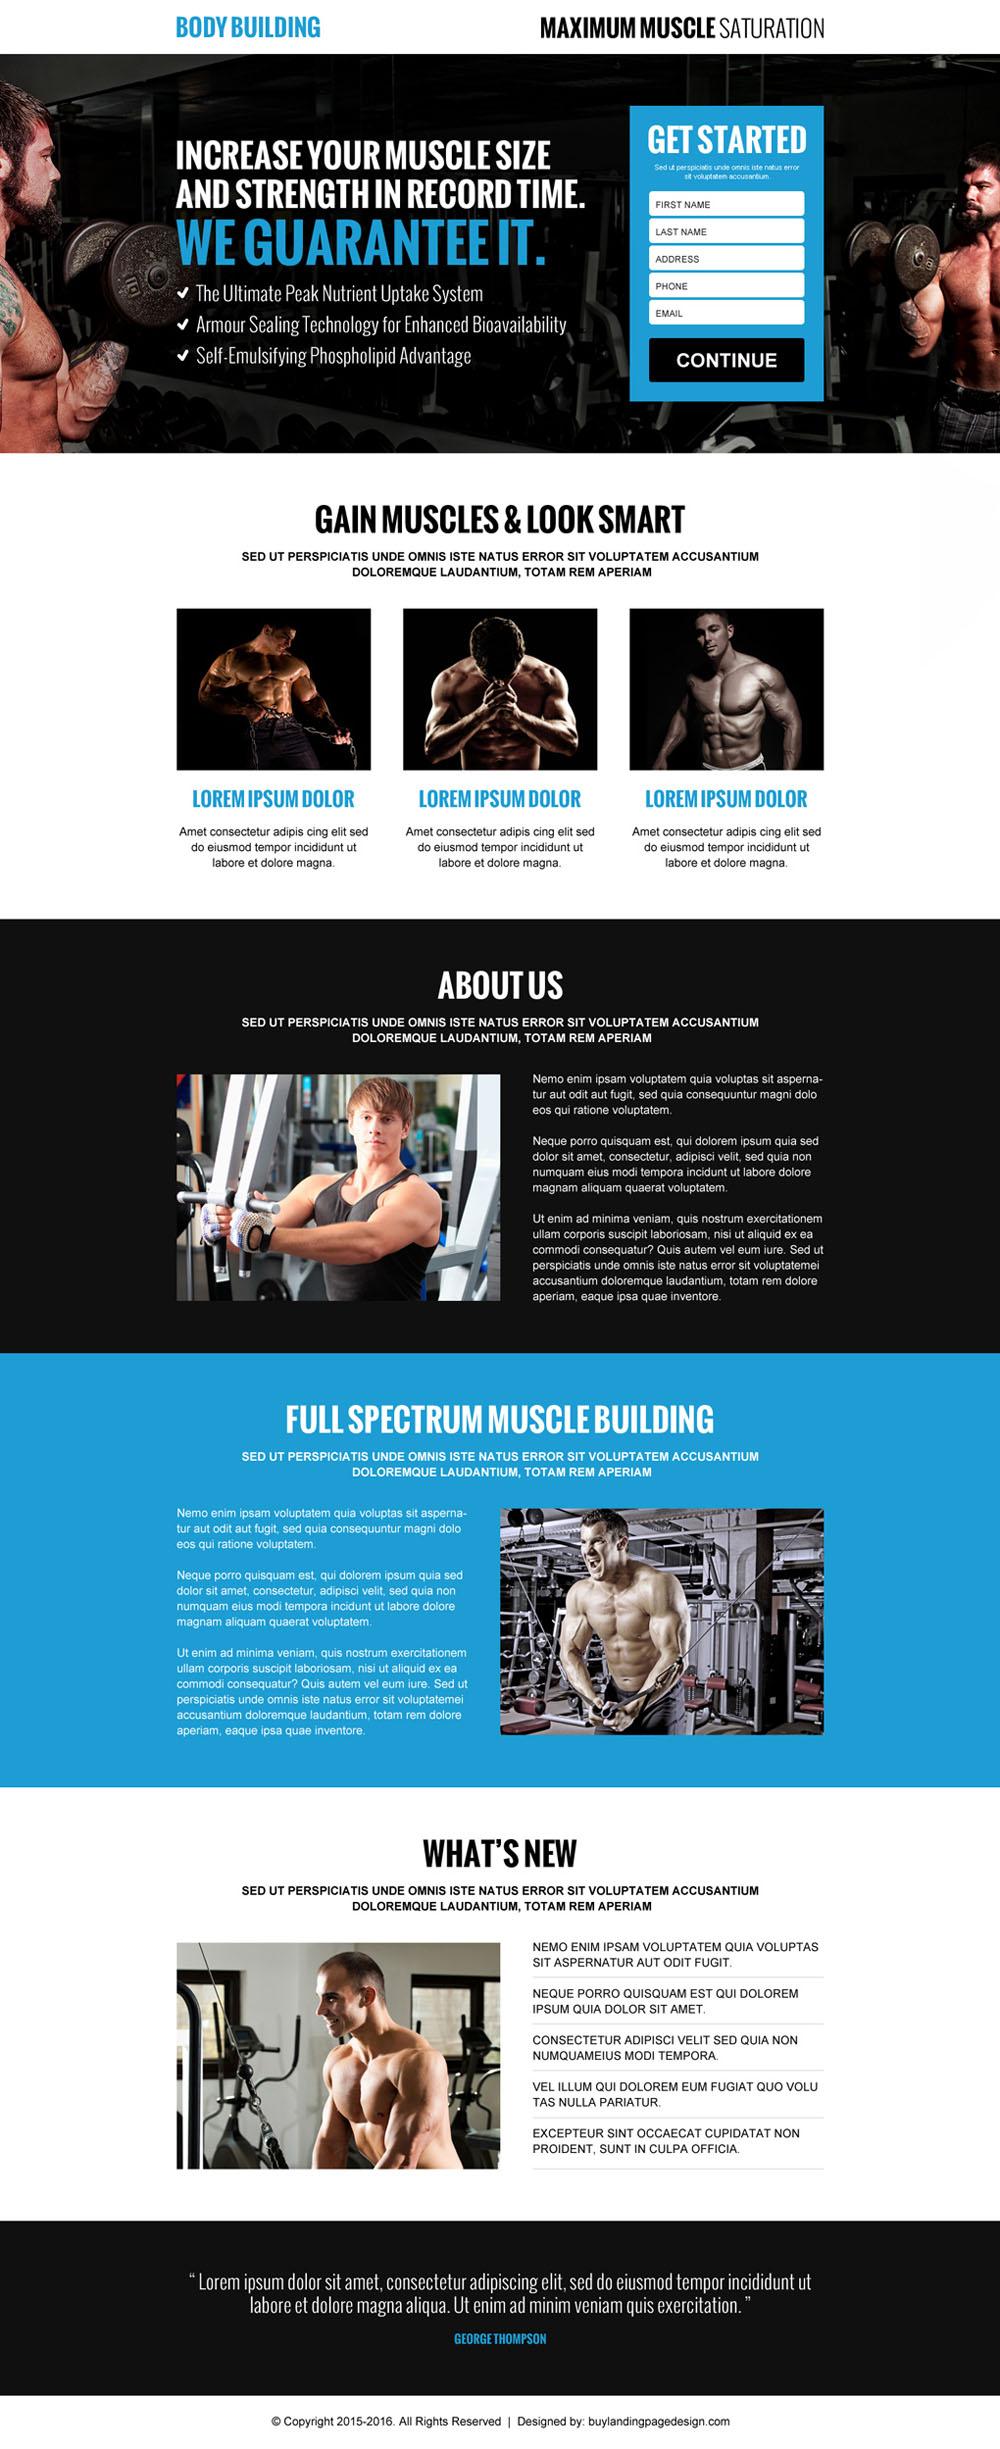 gain-muscles-look-smart-lead-generation-landing-page-design-018